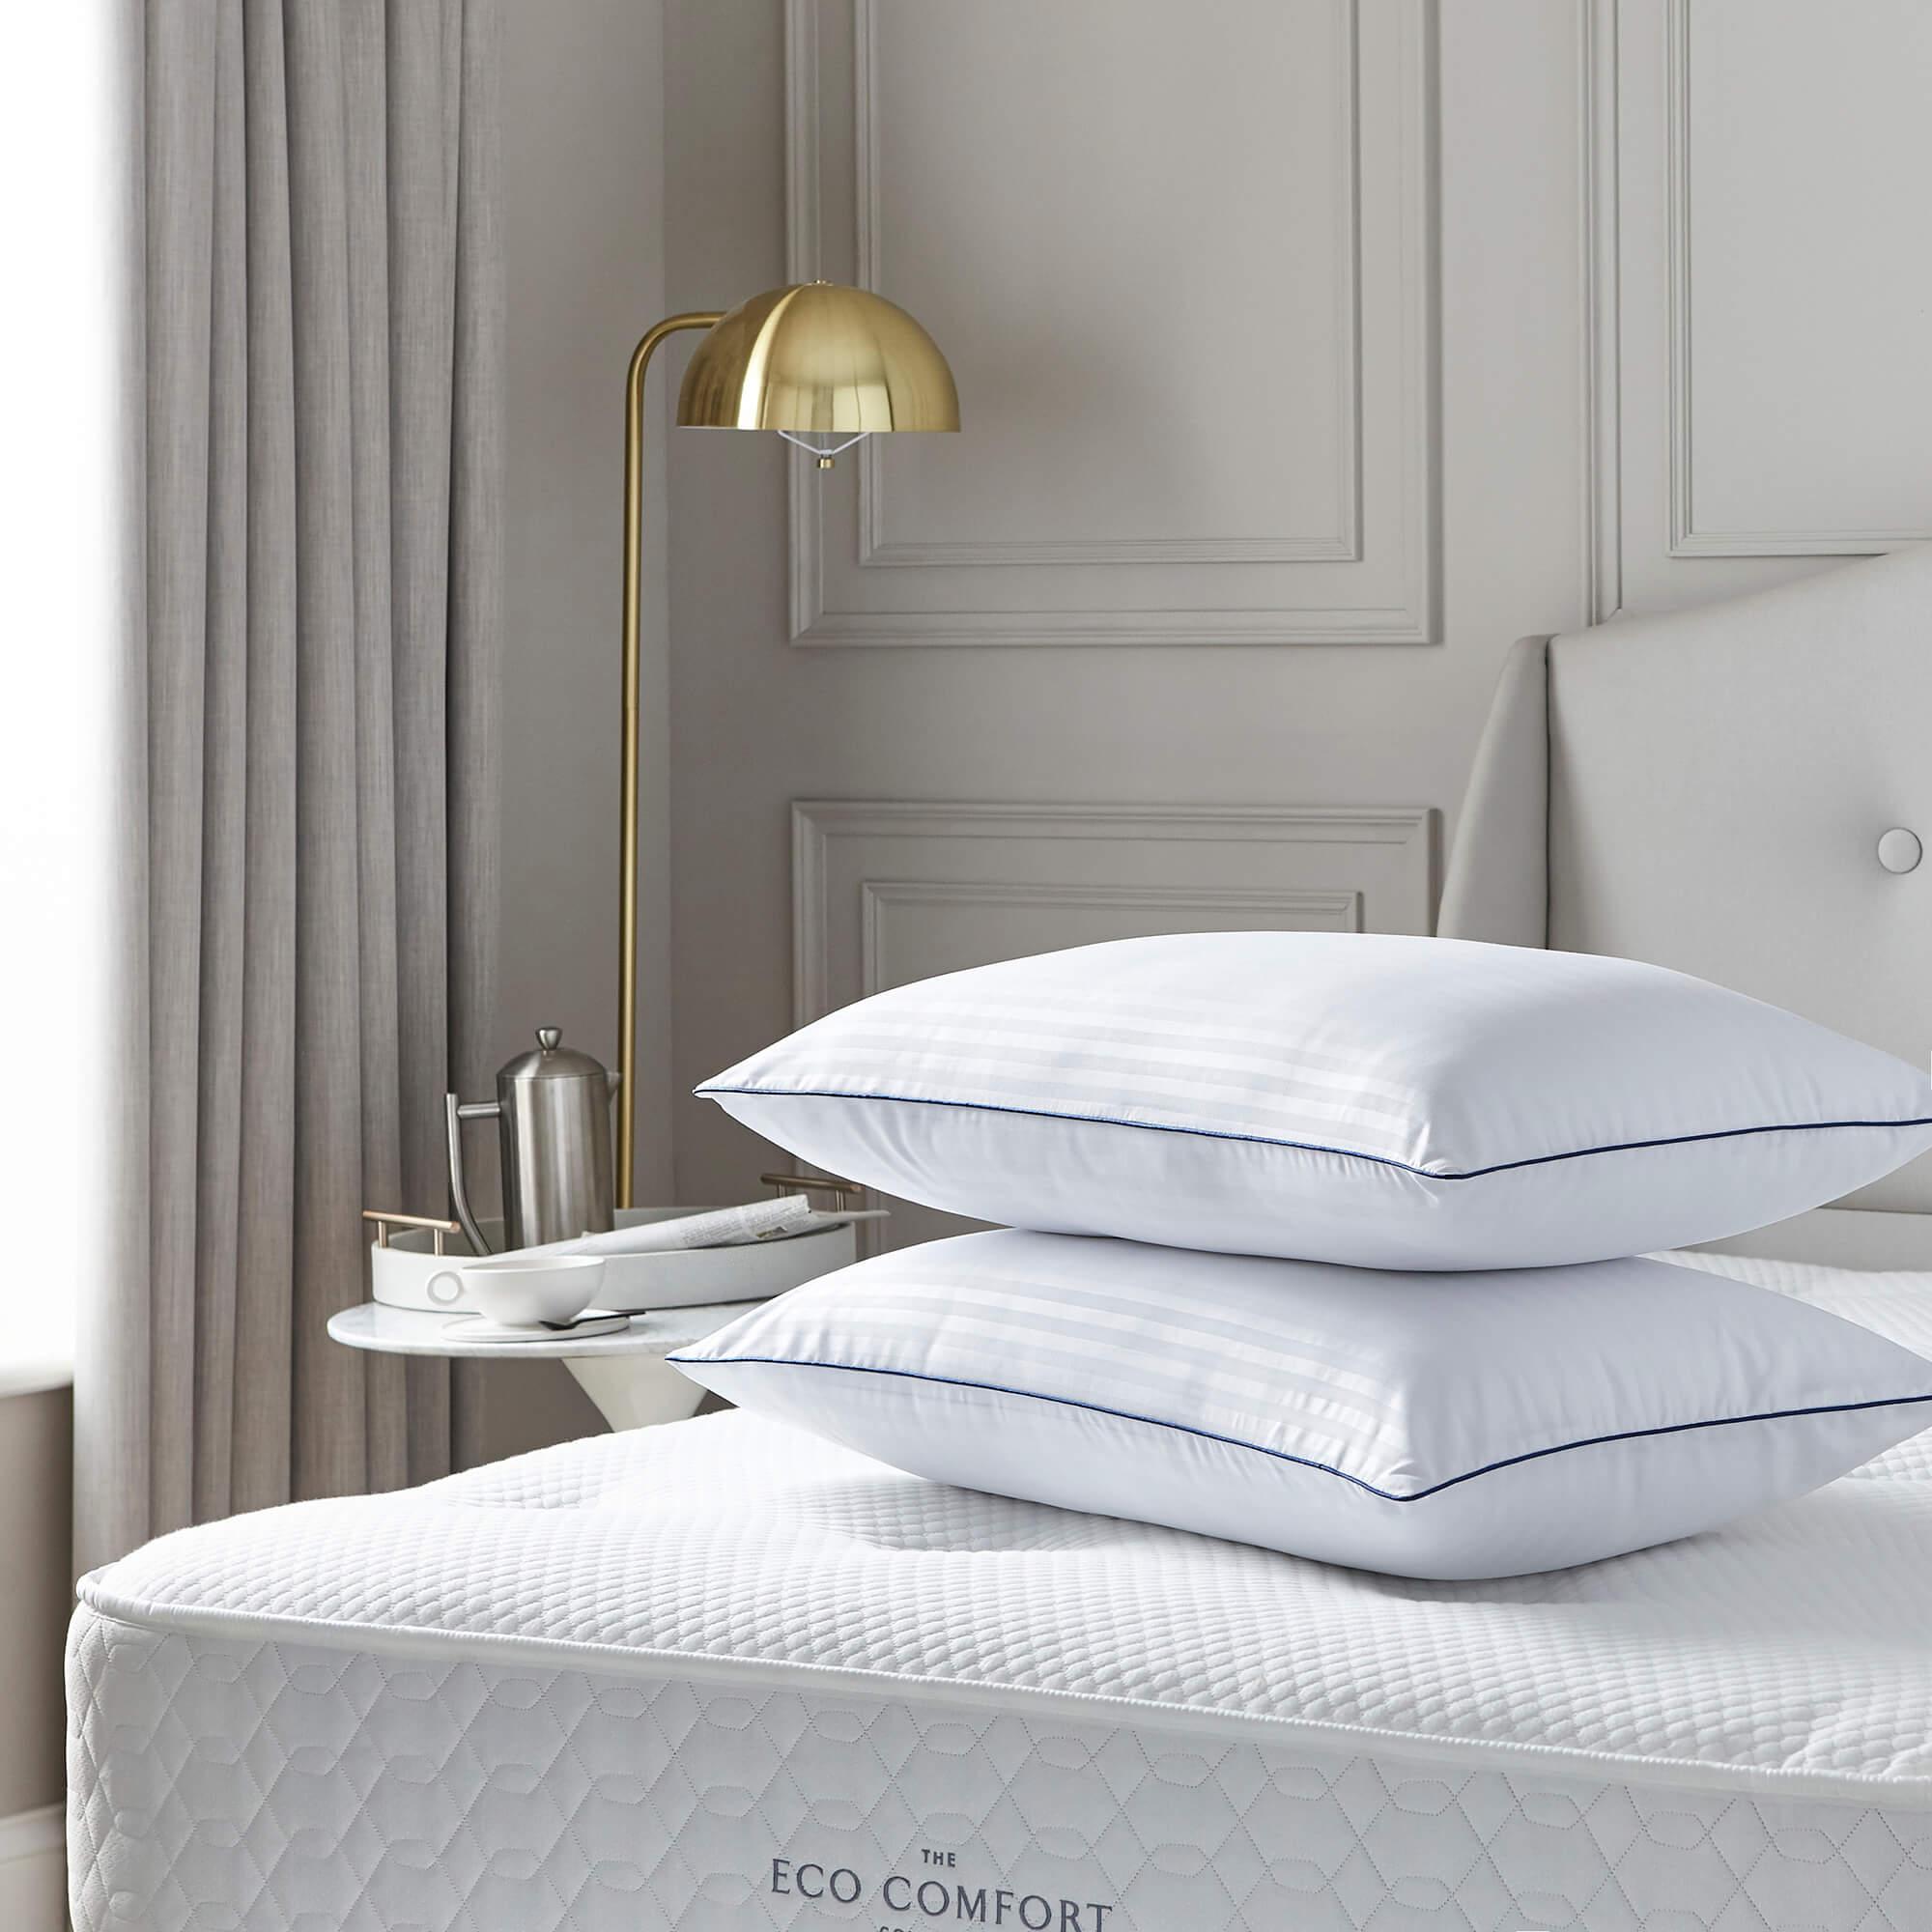 Silentnight Luxury Hotel Co...